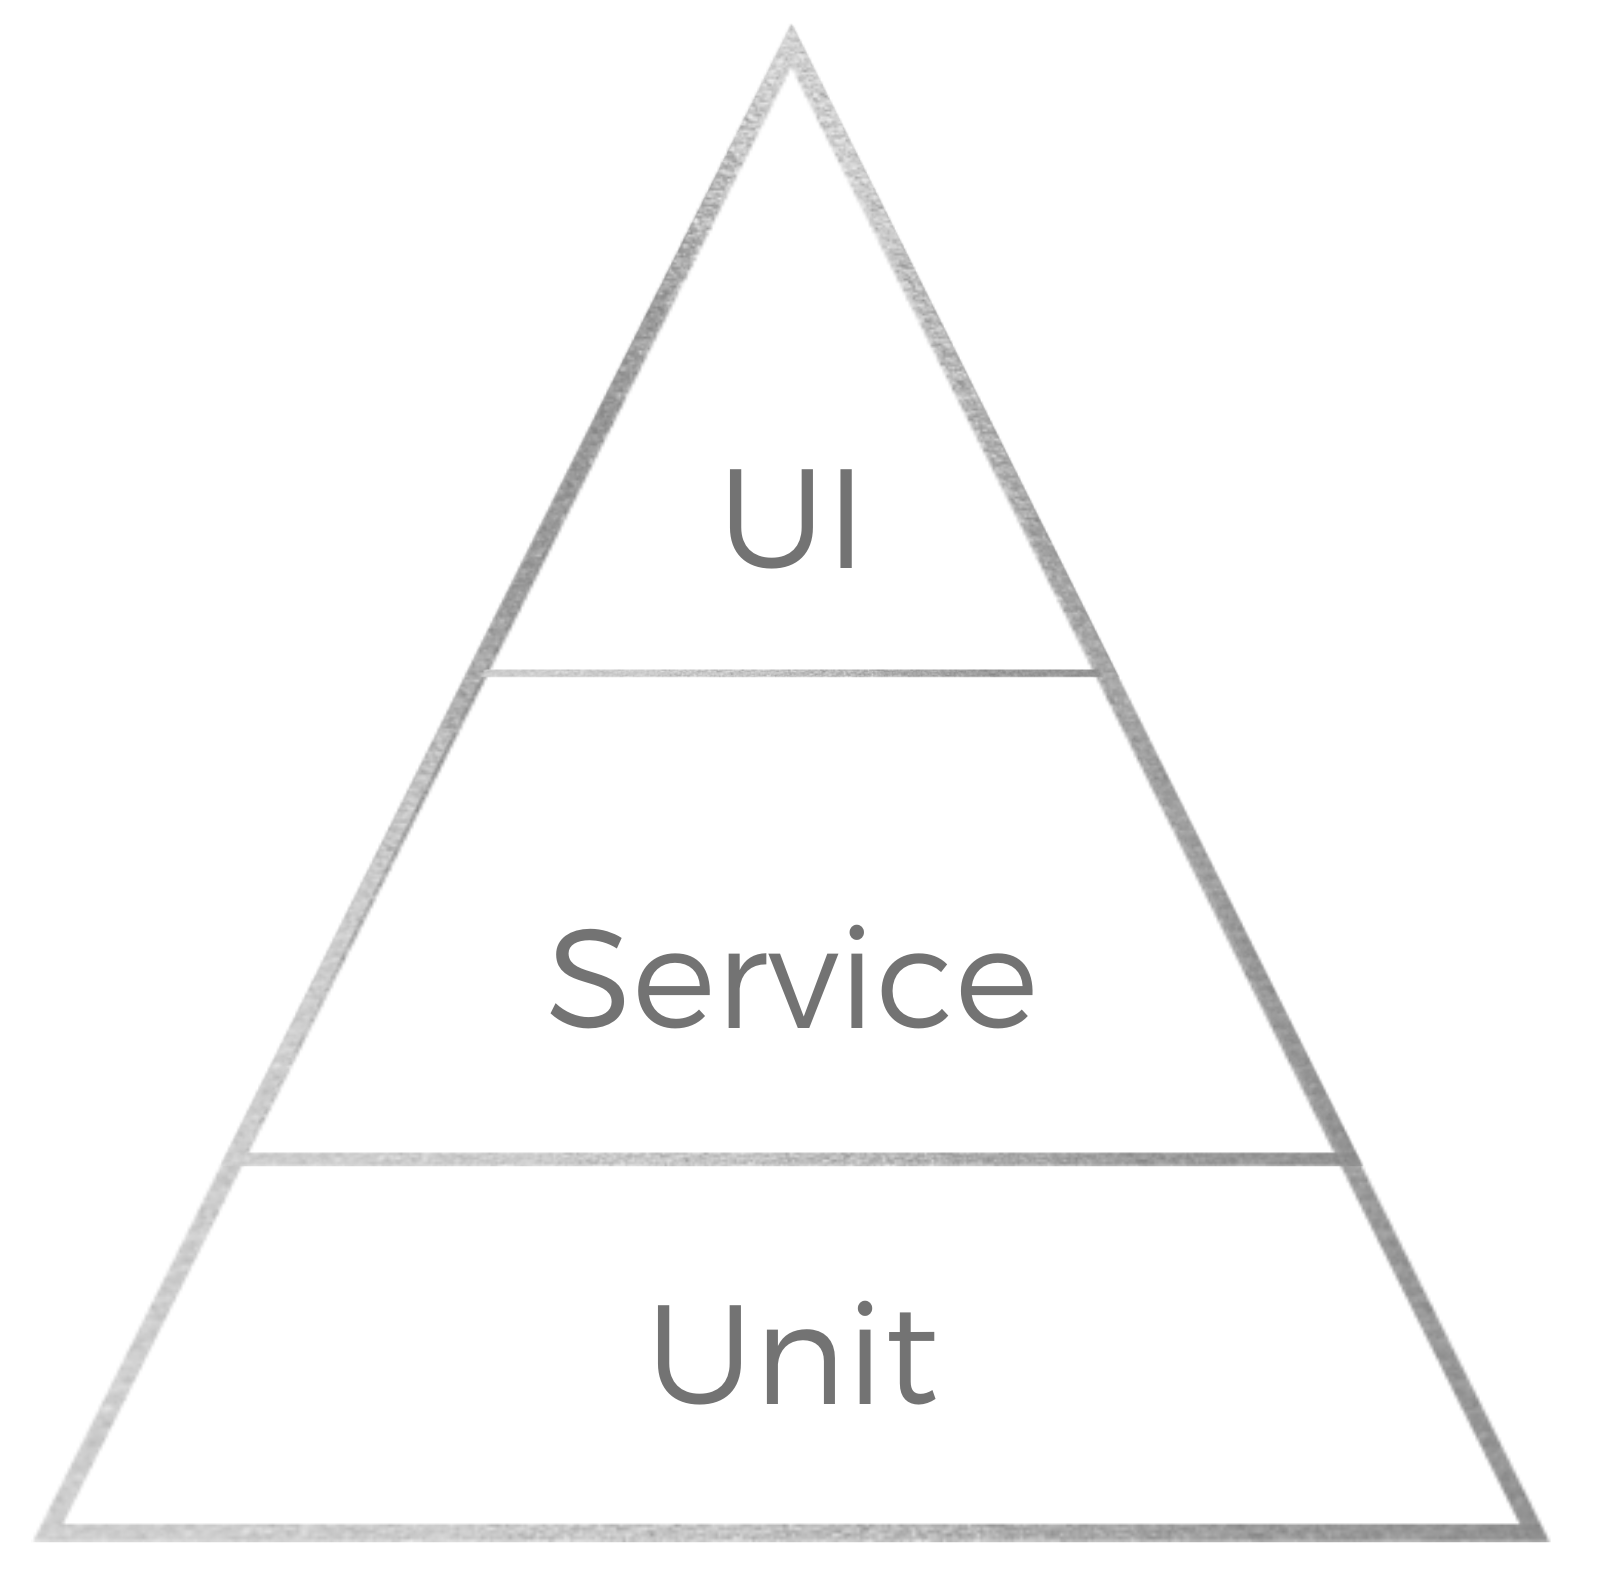 image from Unit Tests vs Integration Tests